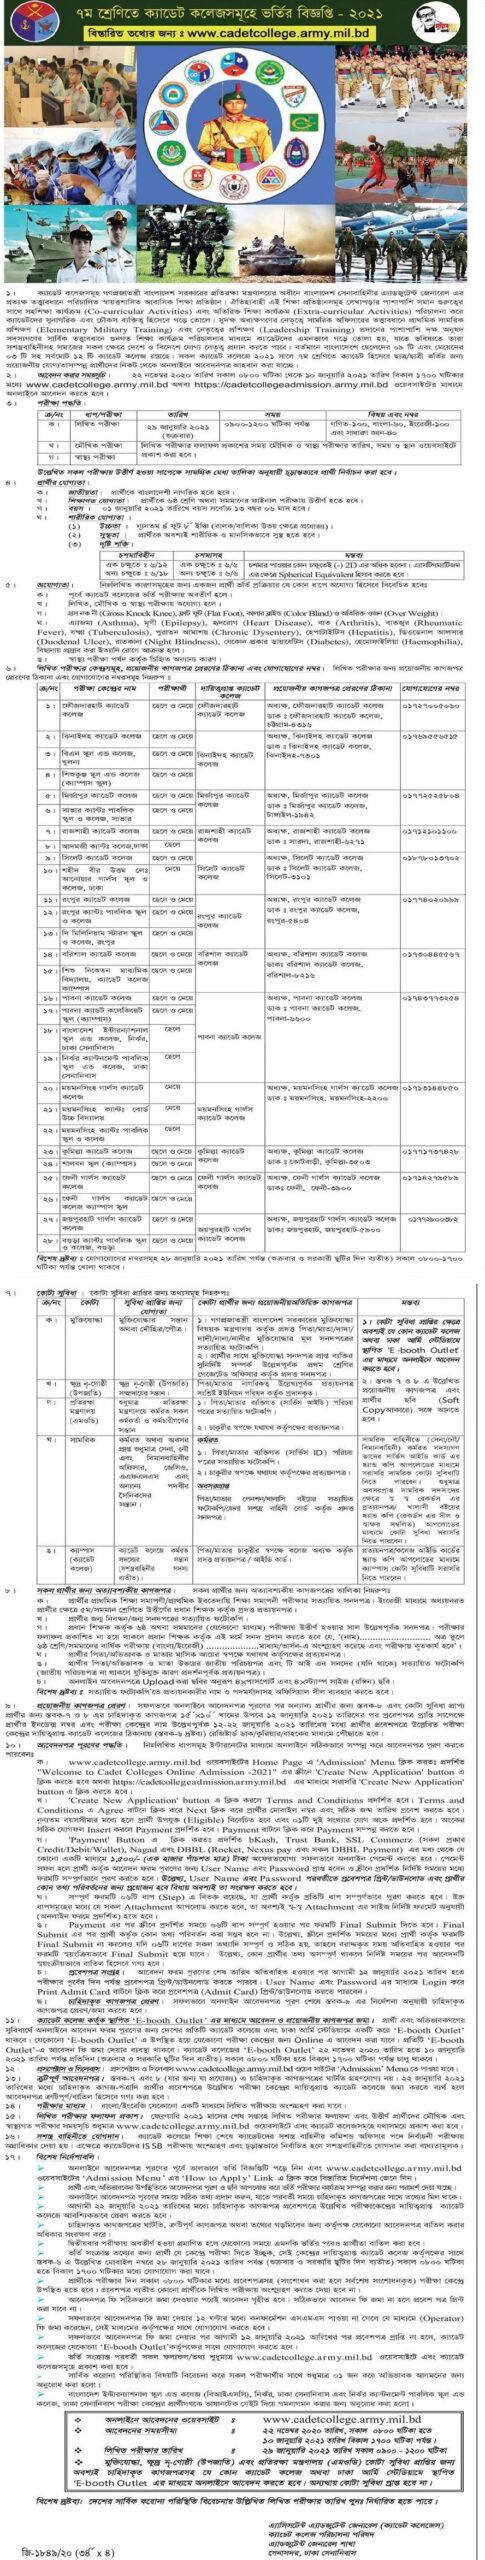 Cadet College Class 7 Admission Circular 2021